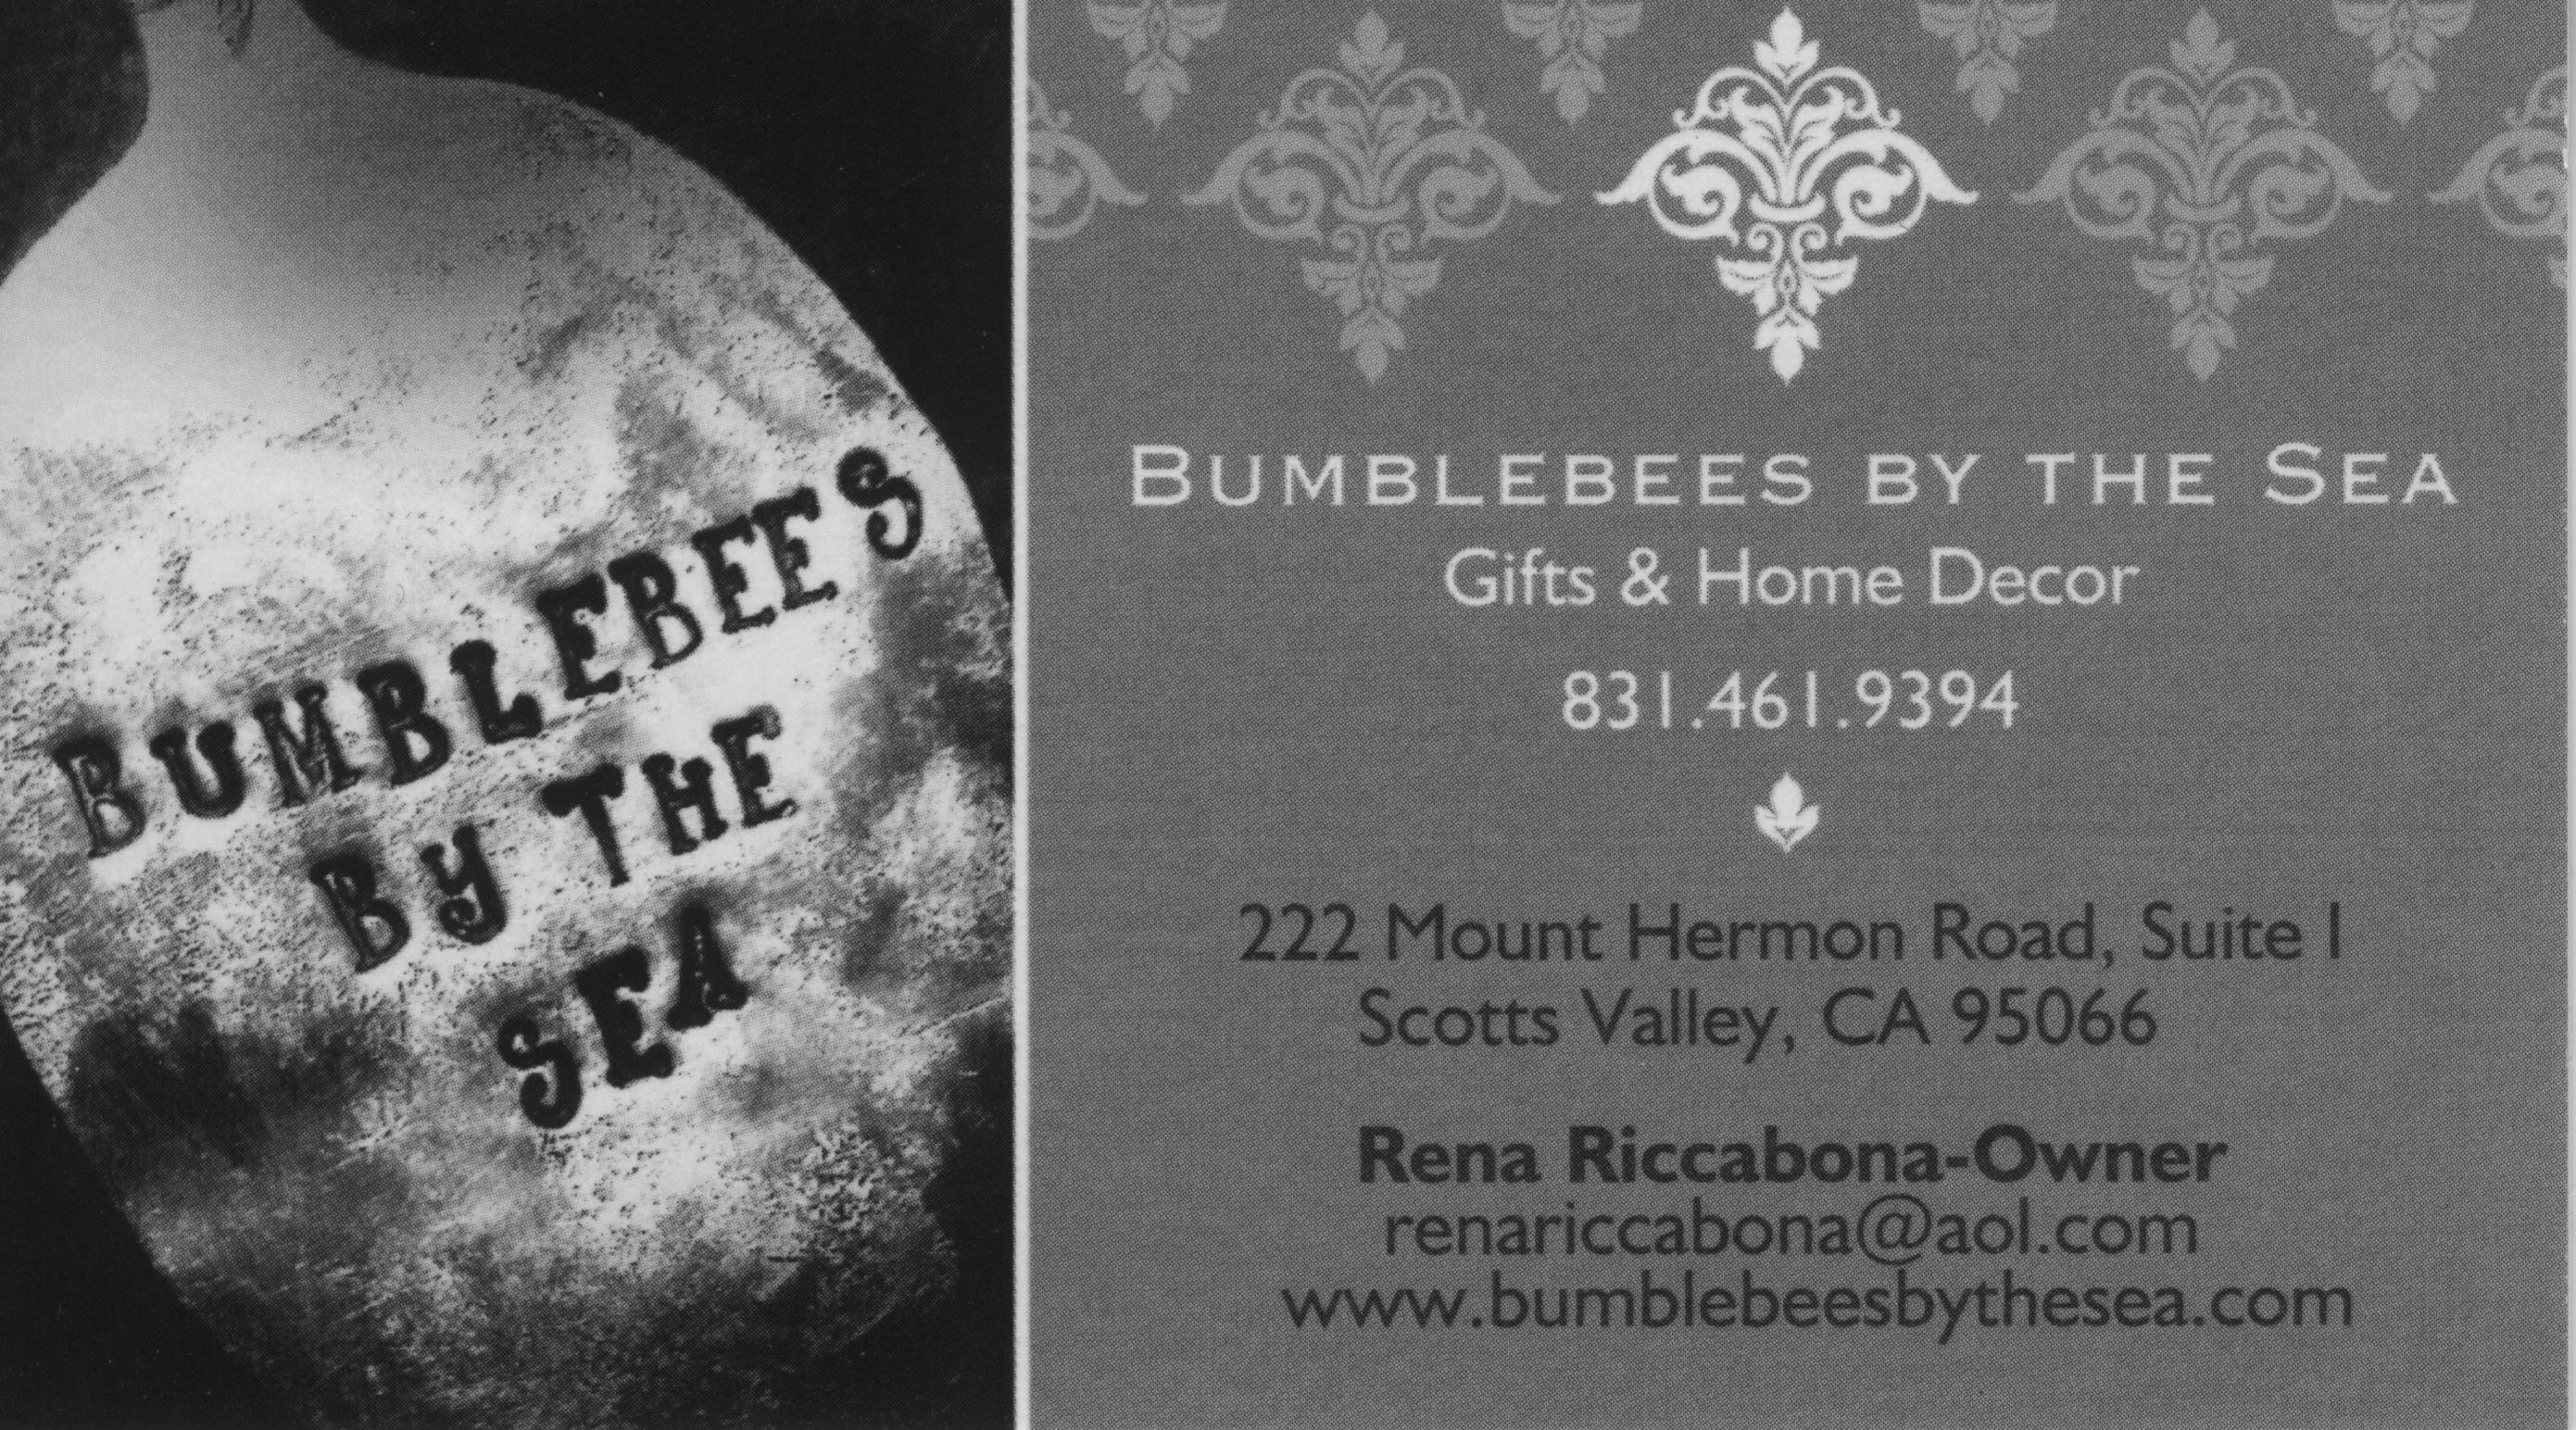 BumbleBee's Ad